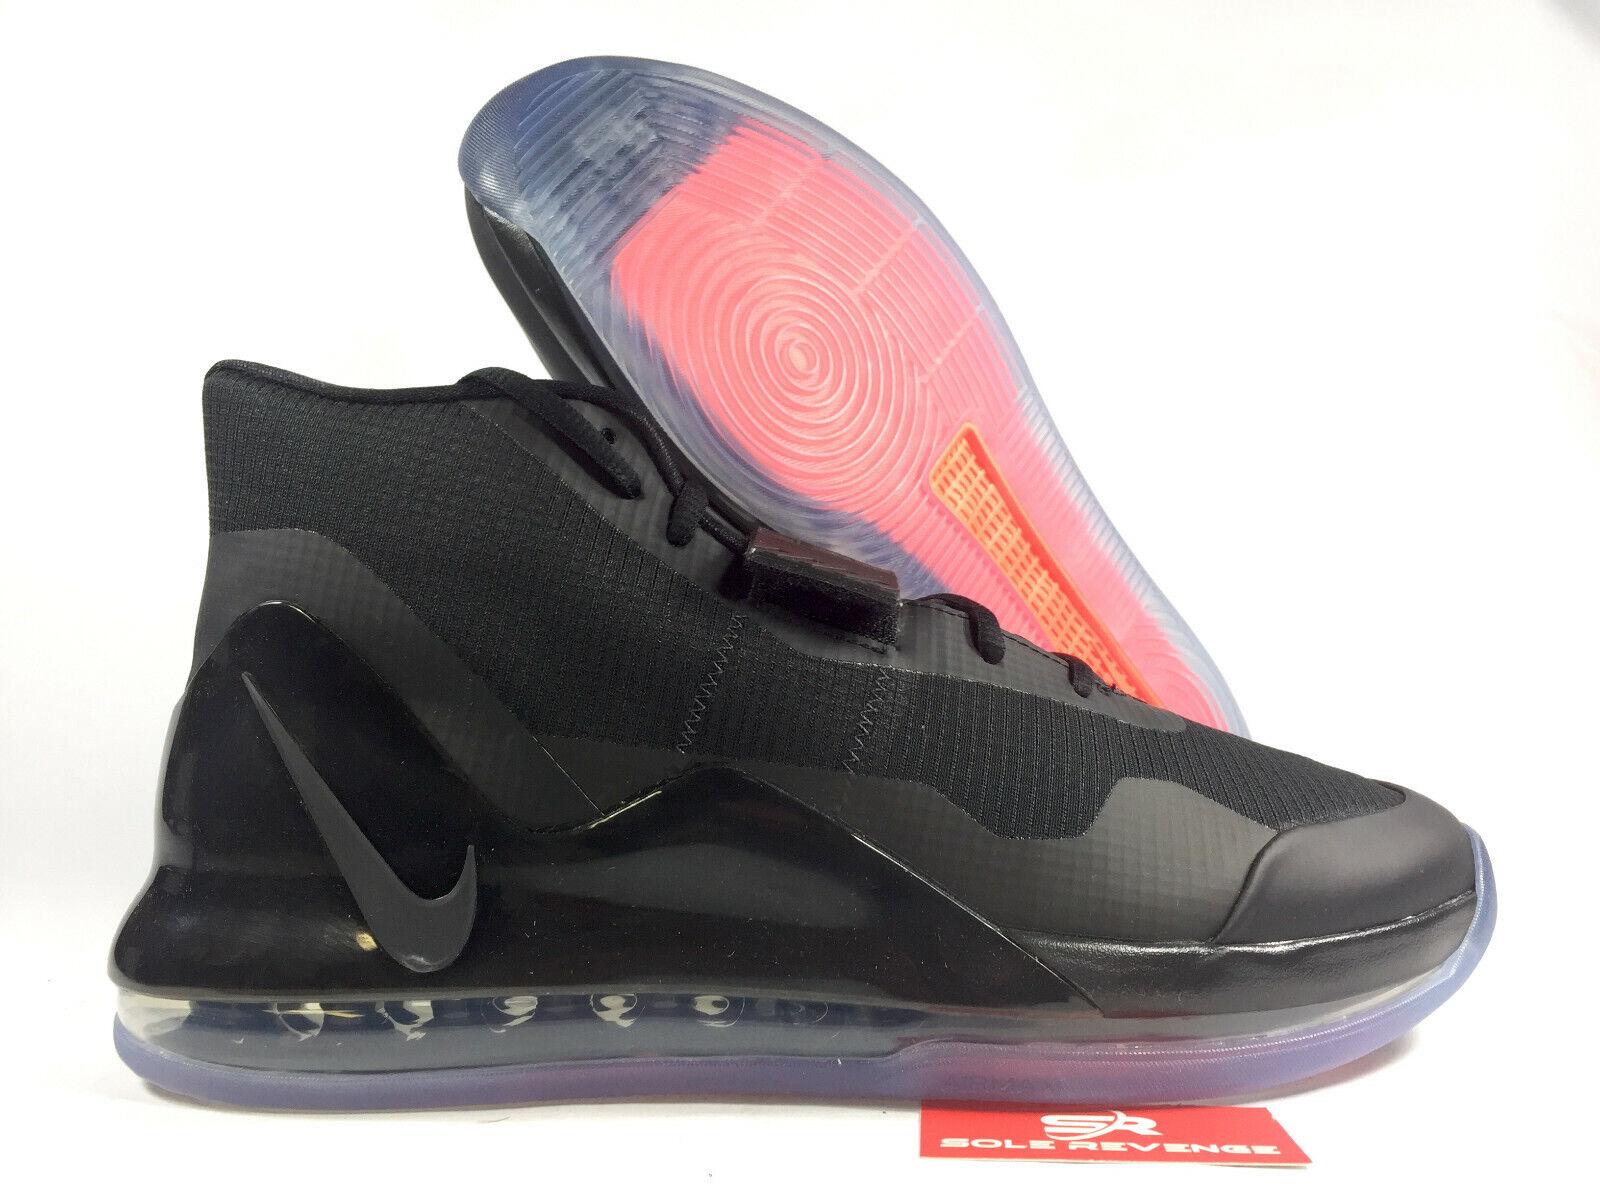 New  NIKE AIR FORCE MAX MEN'S 0974003 Black Bright Crimson Anthracite shoes c1